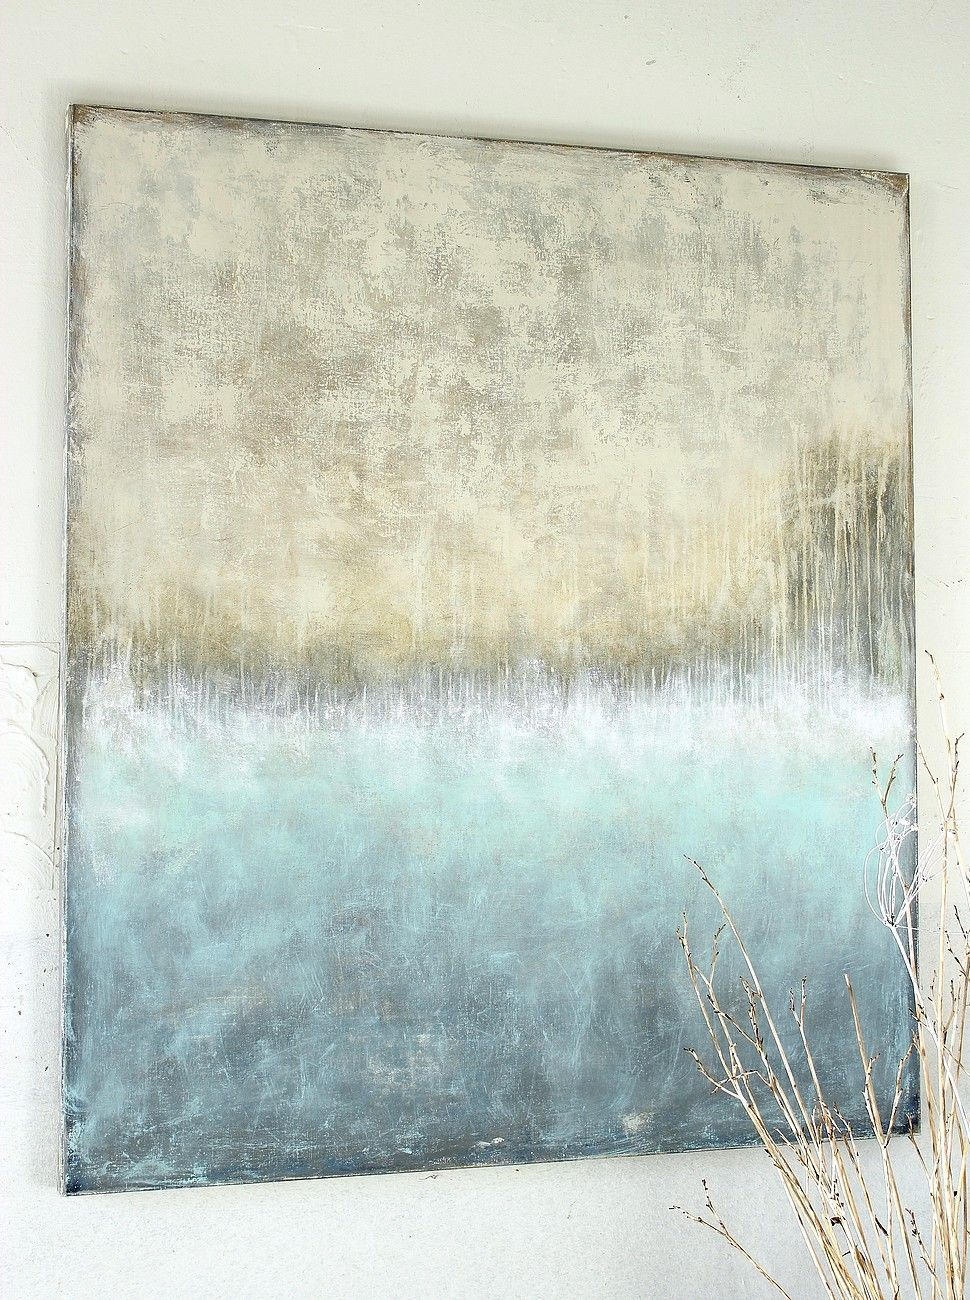 2014 150 x 130 x 4 cm mischtechnik auf leinwand abstrakte kunst malerei leinwand painting abstract contemporary abstractart